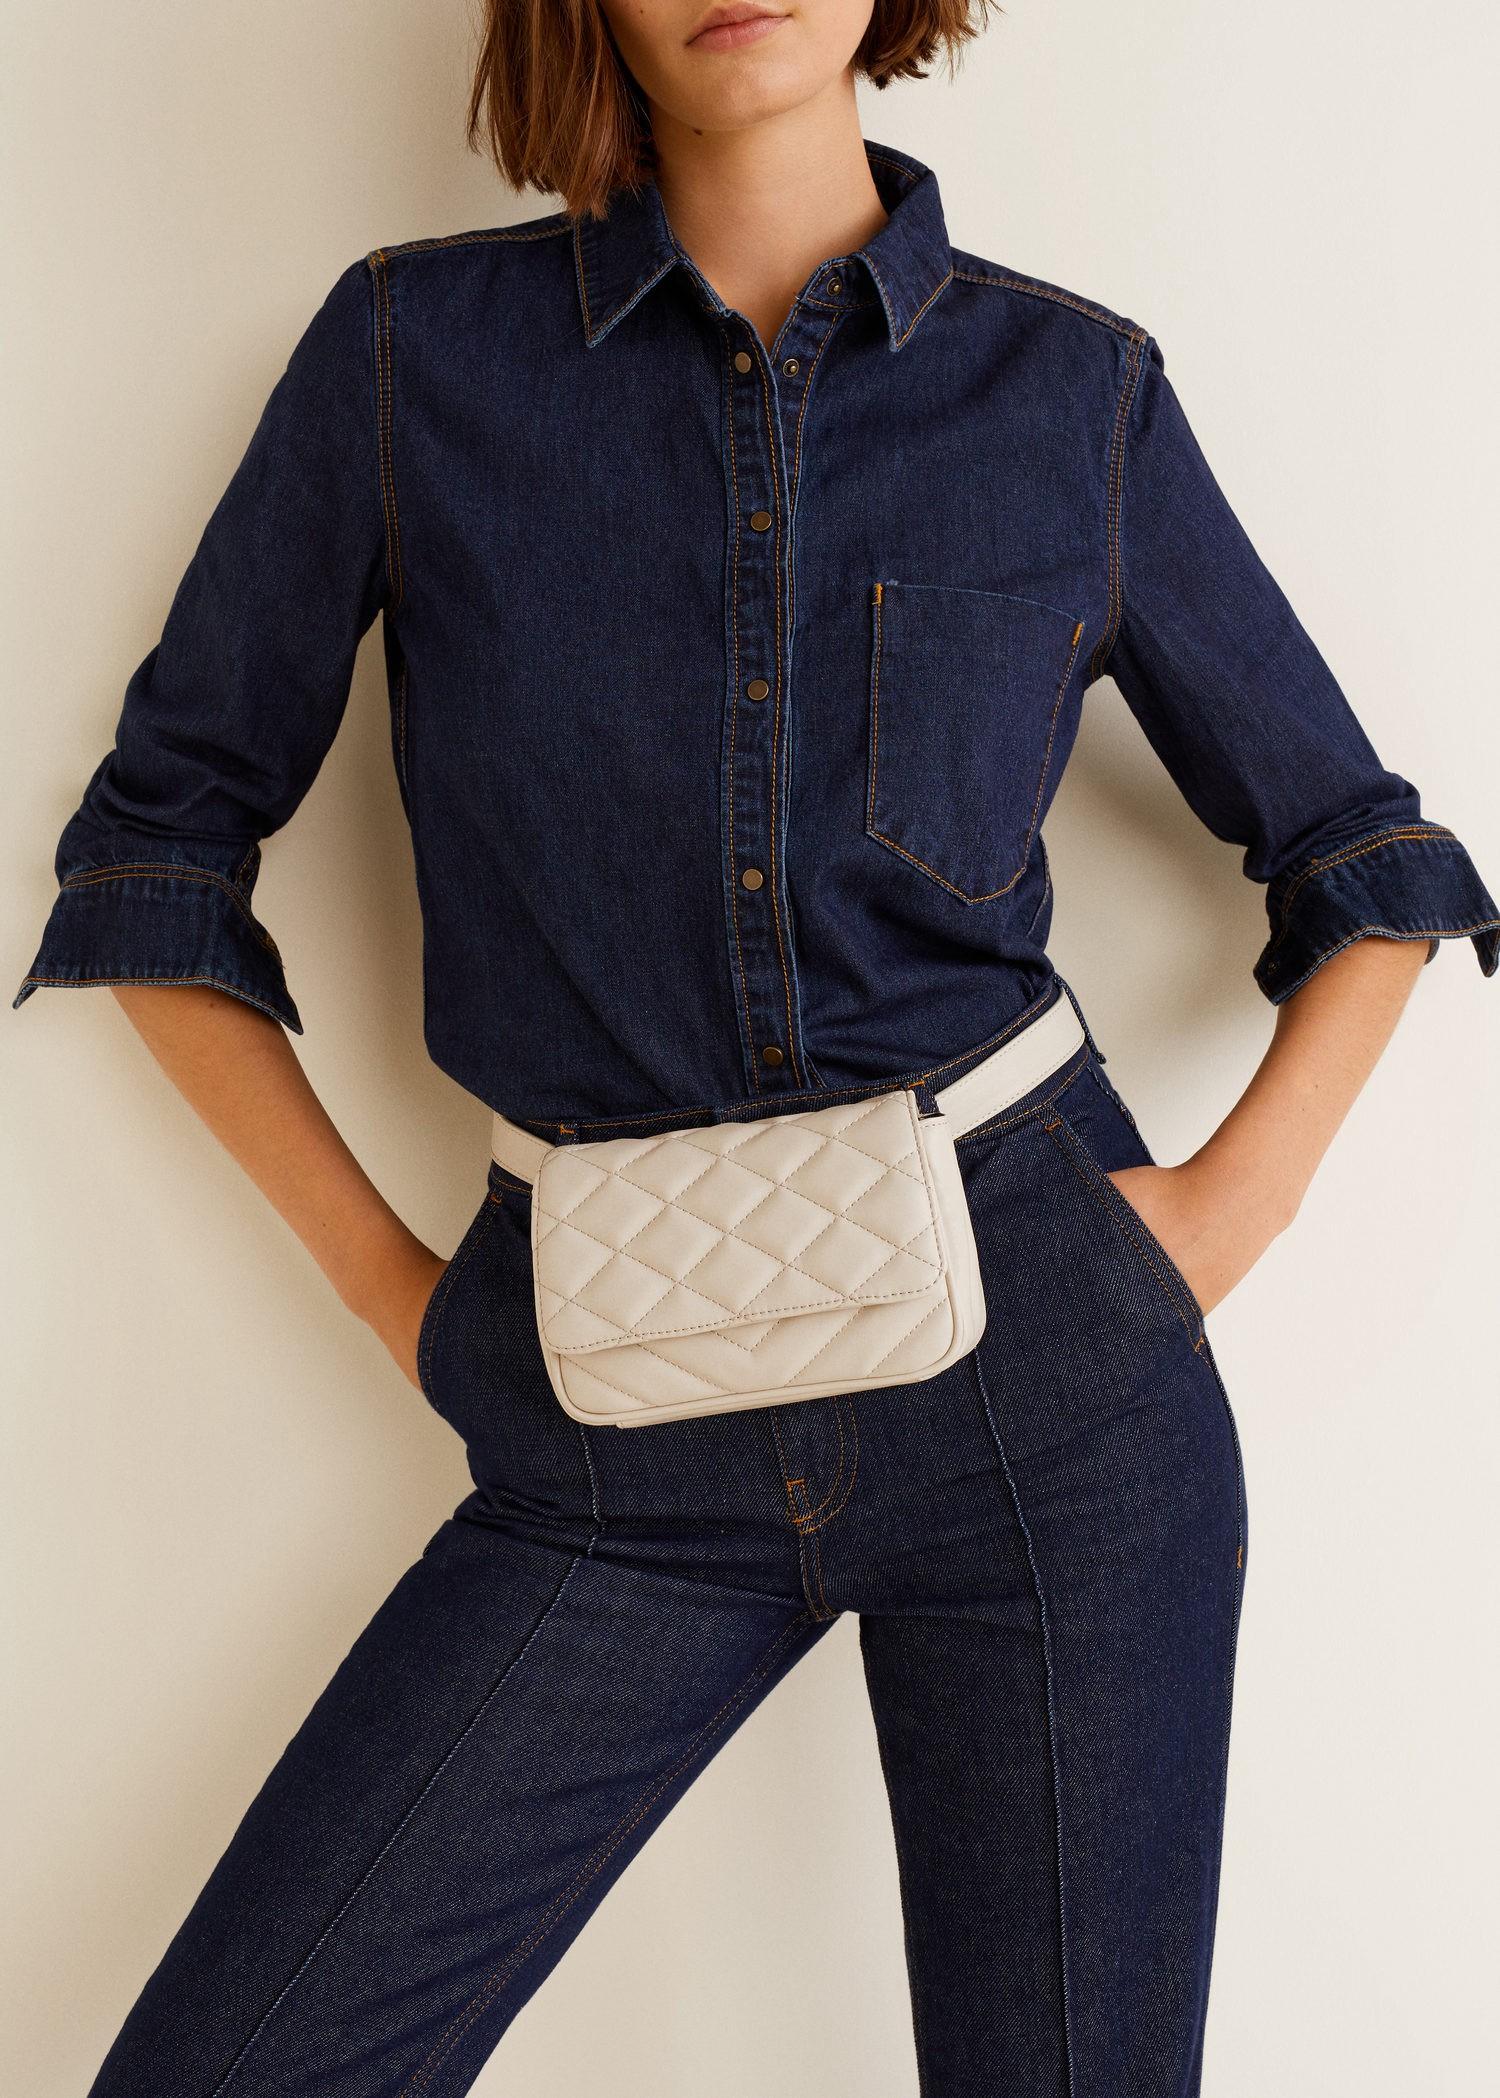 c902ef364c0 Mango Quilted Belt Bag - Ecru One Size in 2019 | Belt bag | Bags ...